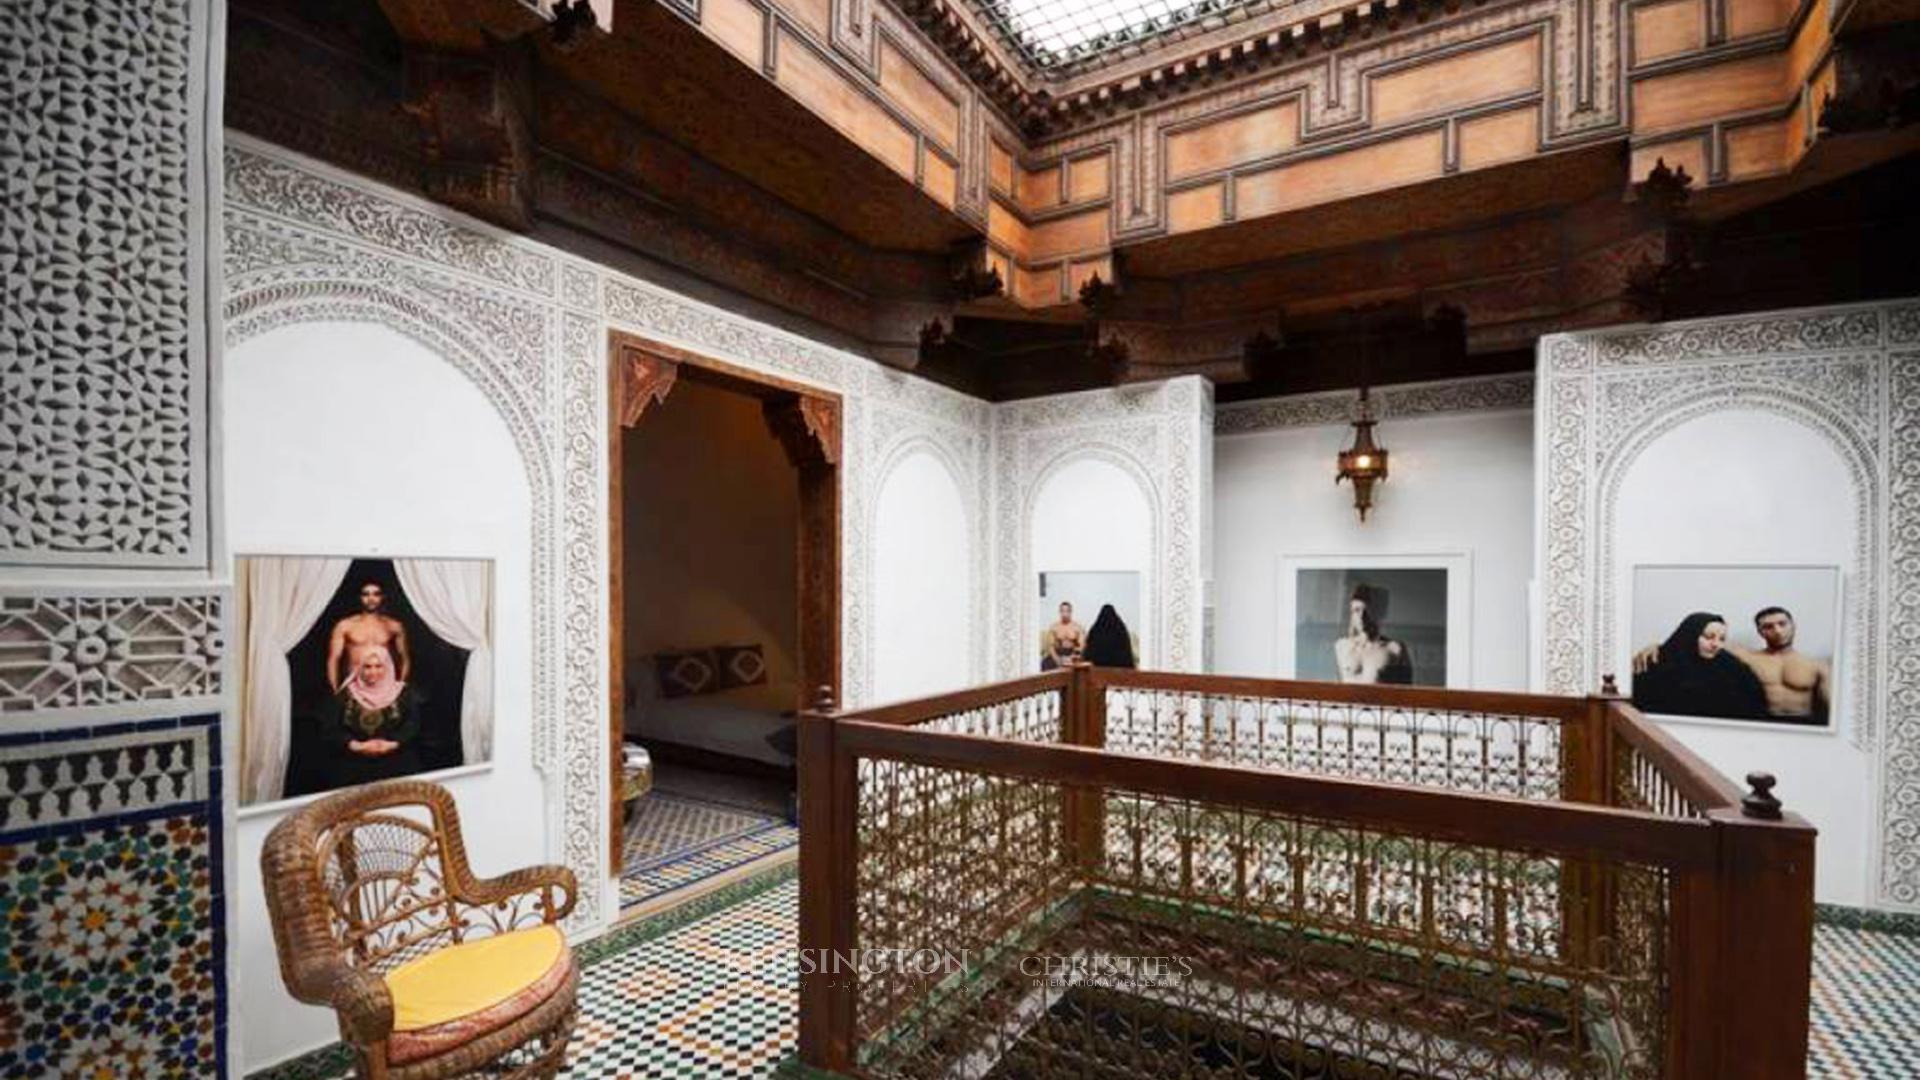 Riad  Vendre Fes  Riad In Fes Besoin De Renovation  Kensington Morocco  Kensington Maroc